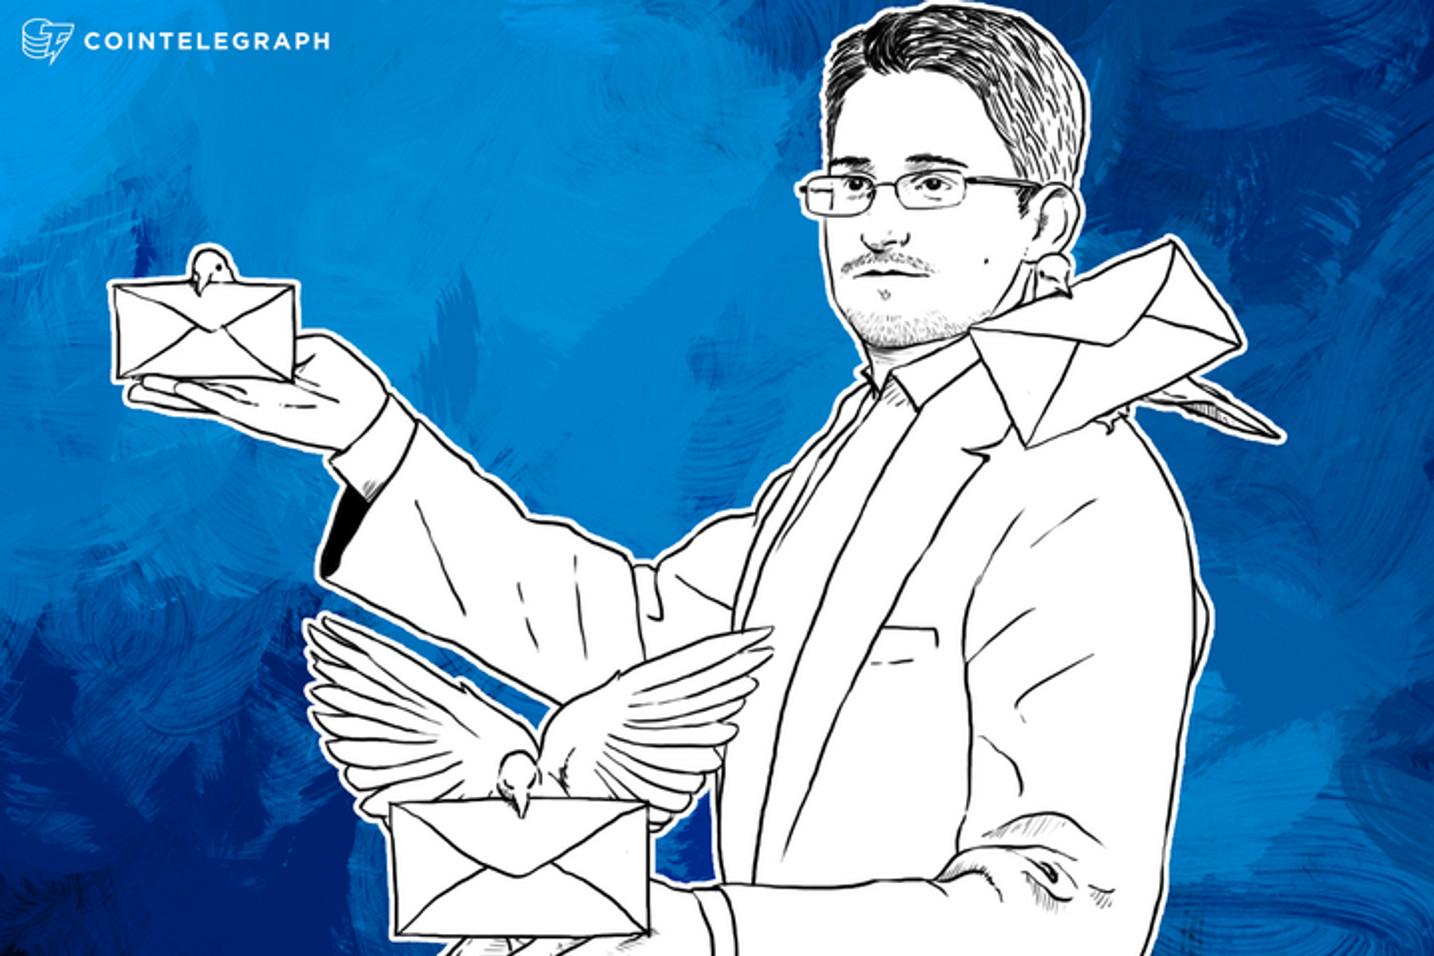 Skype Alternatives, Part 2: Edward Snowden's Recommendations